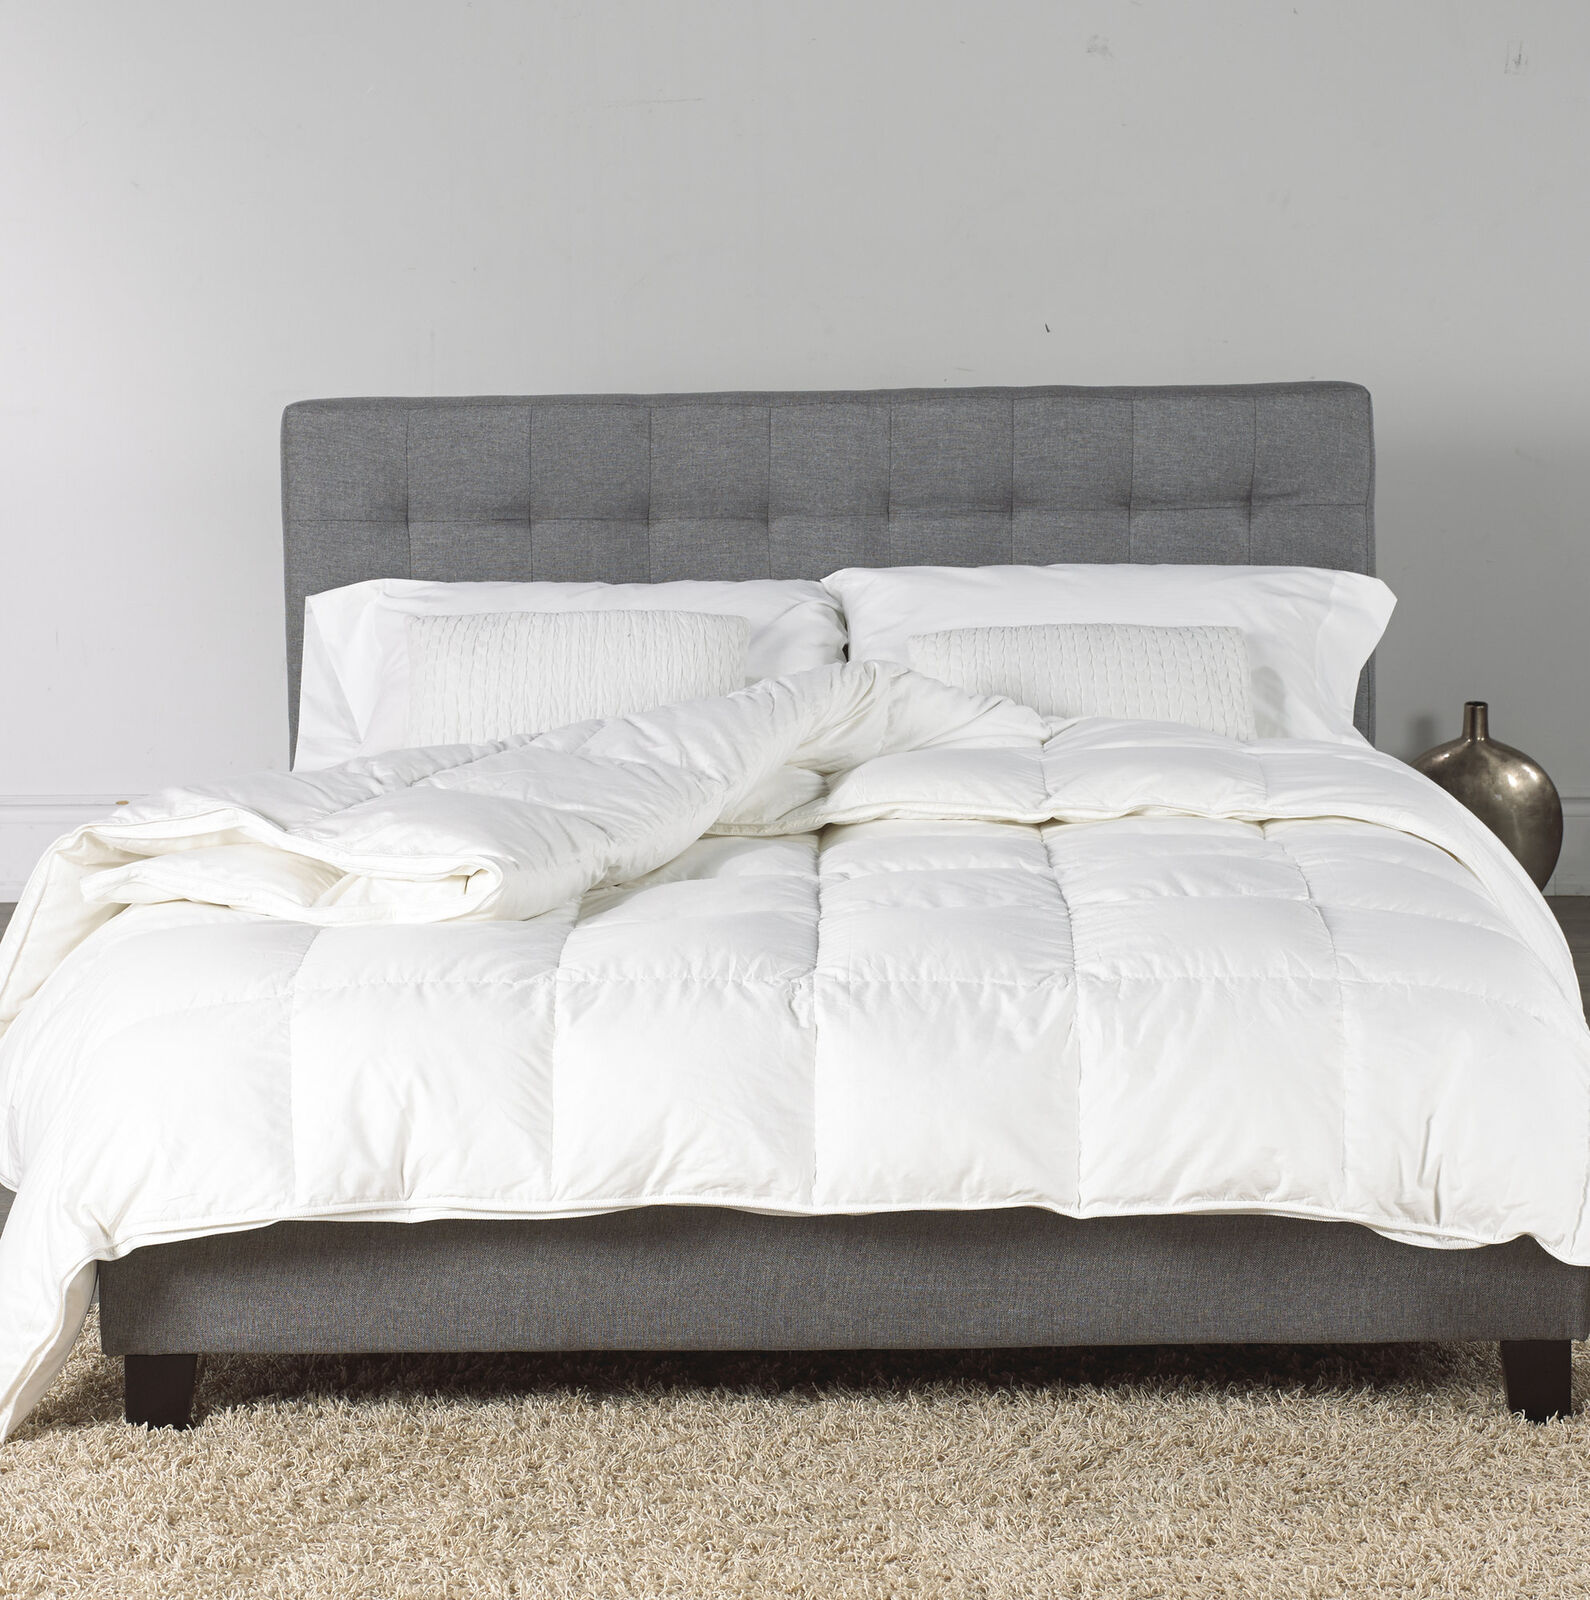 Alwyn Home Gorman Microgel All Season Down Alternative Comforter